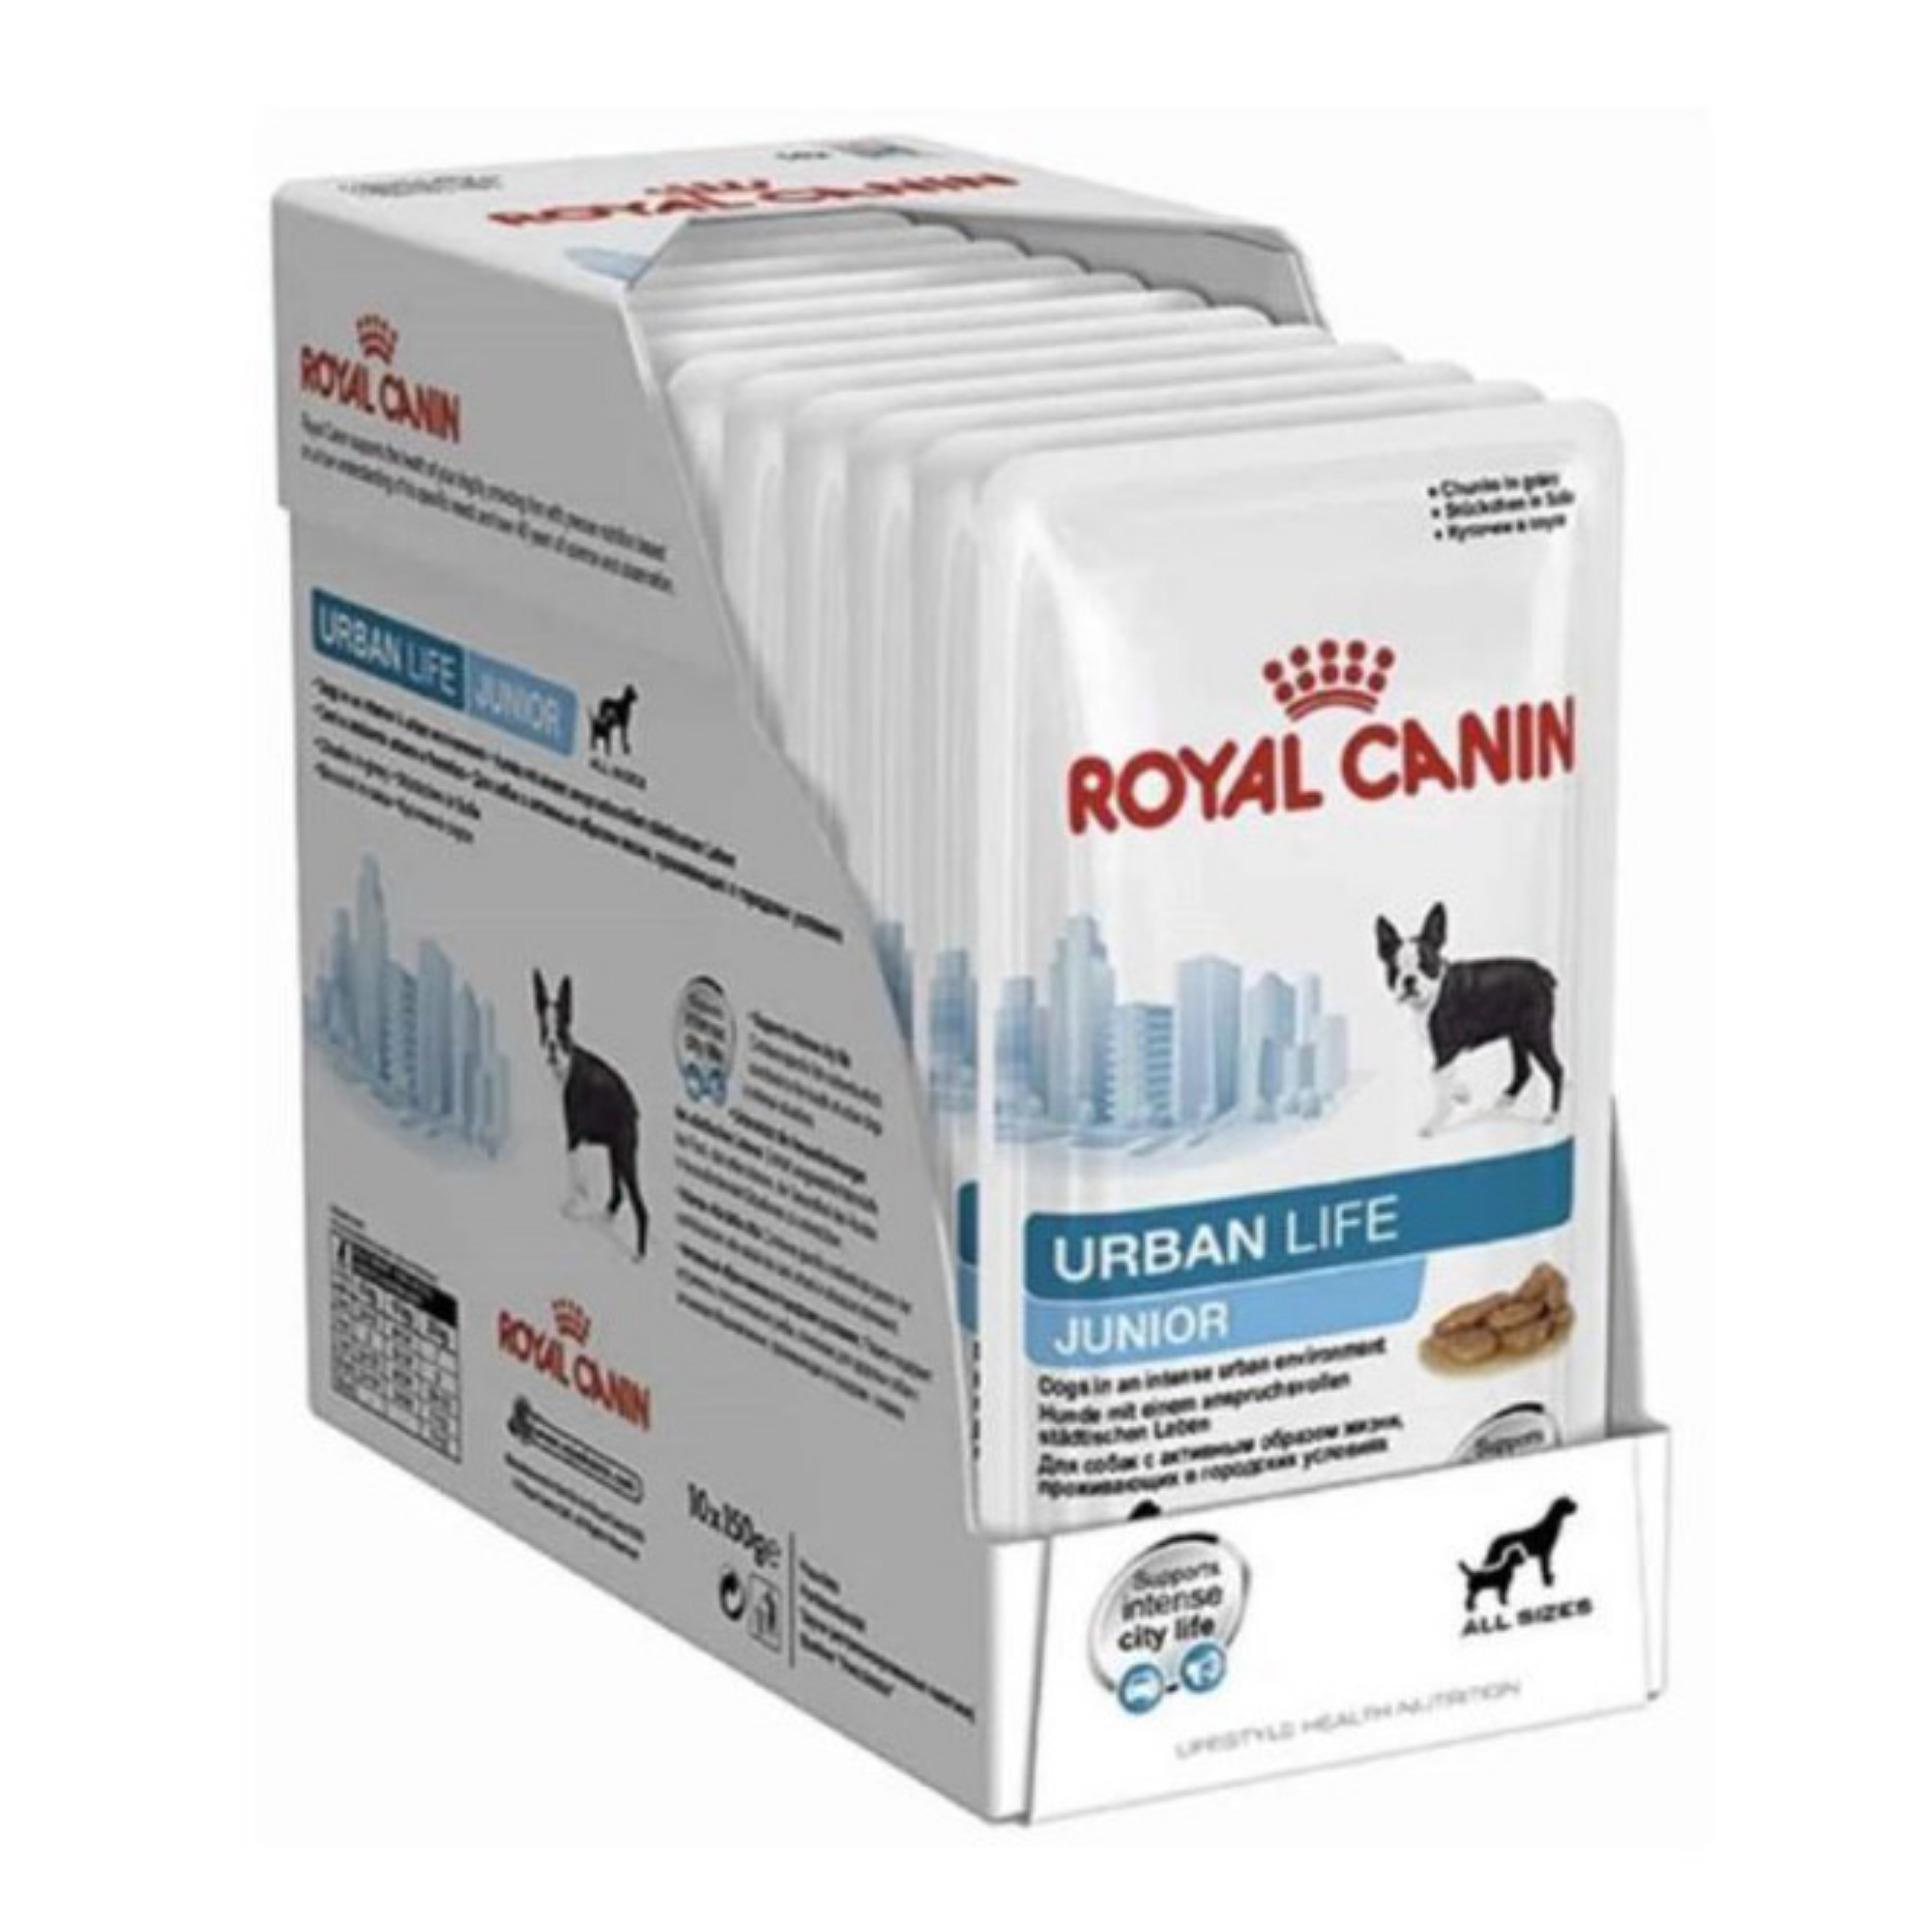 Royal Canin Urban Life Adult Dog 10x150g